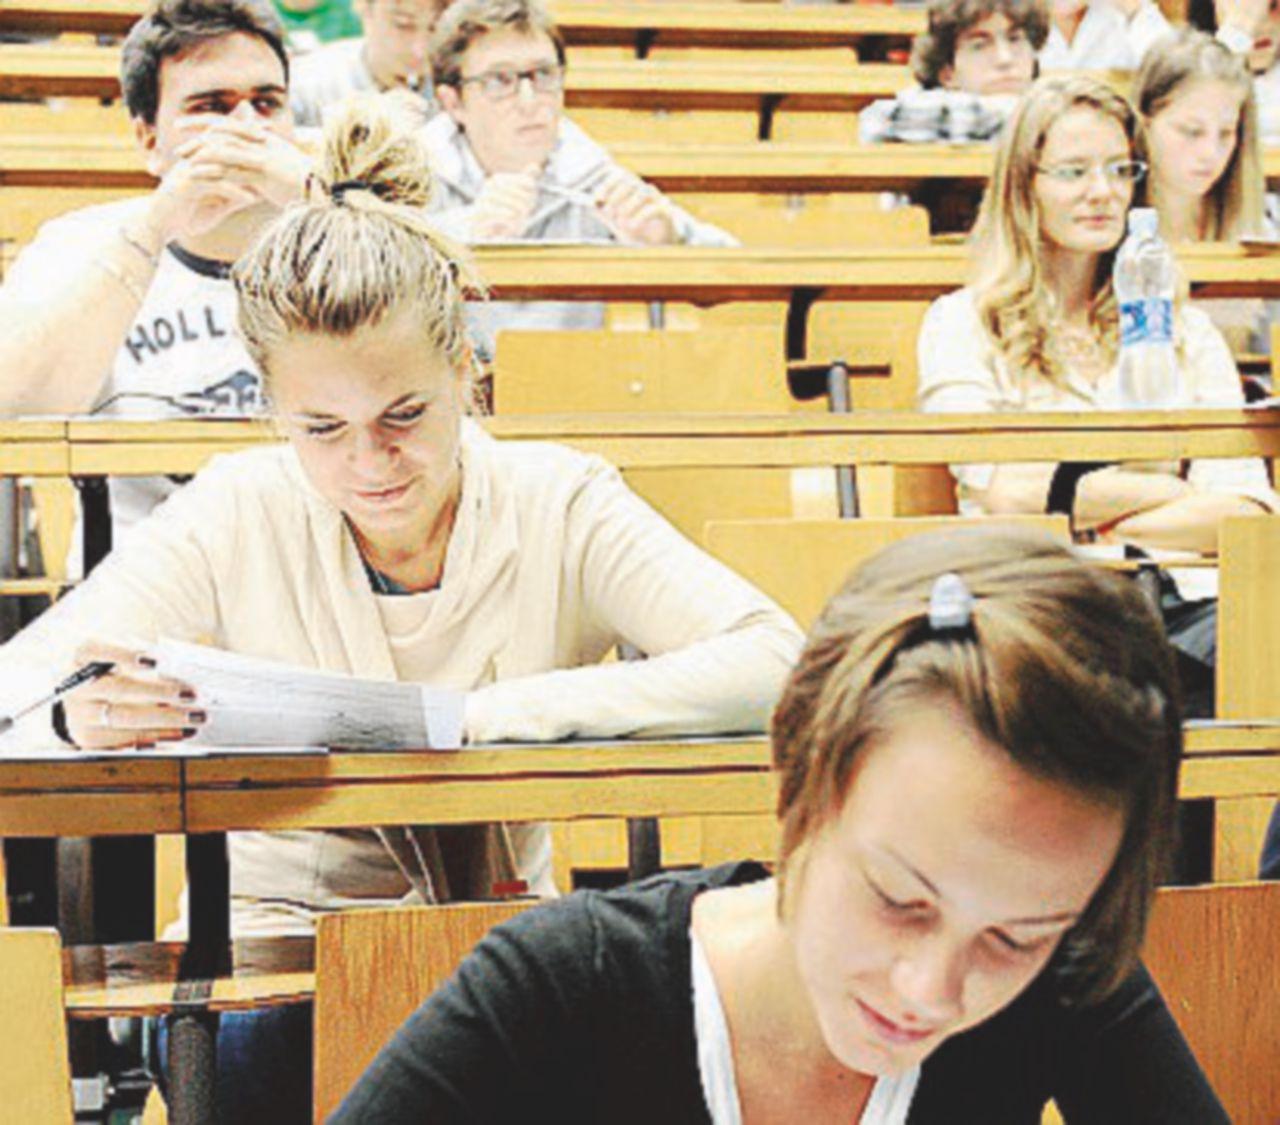 Borse di studio: ne mancano diecimila